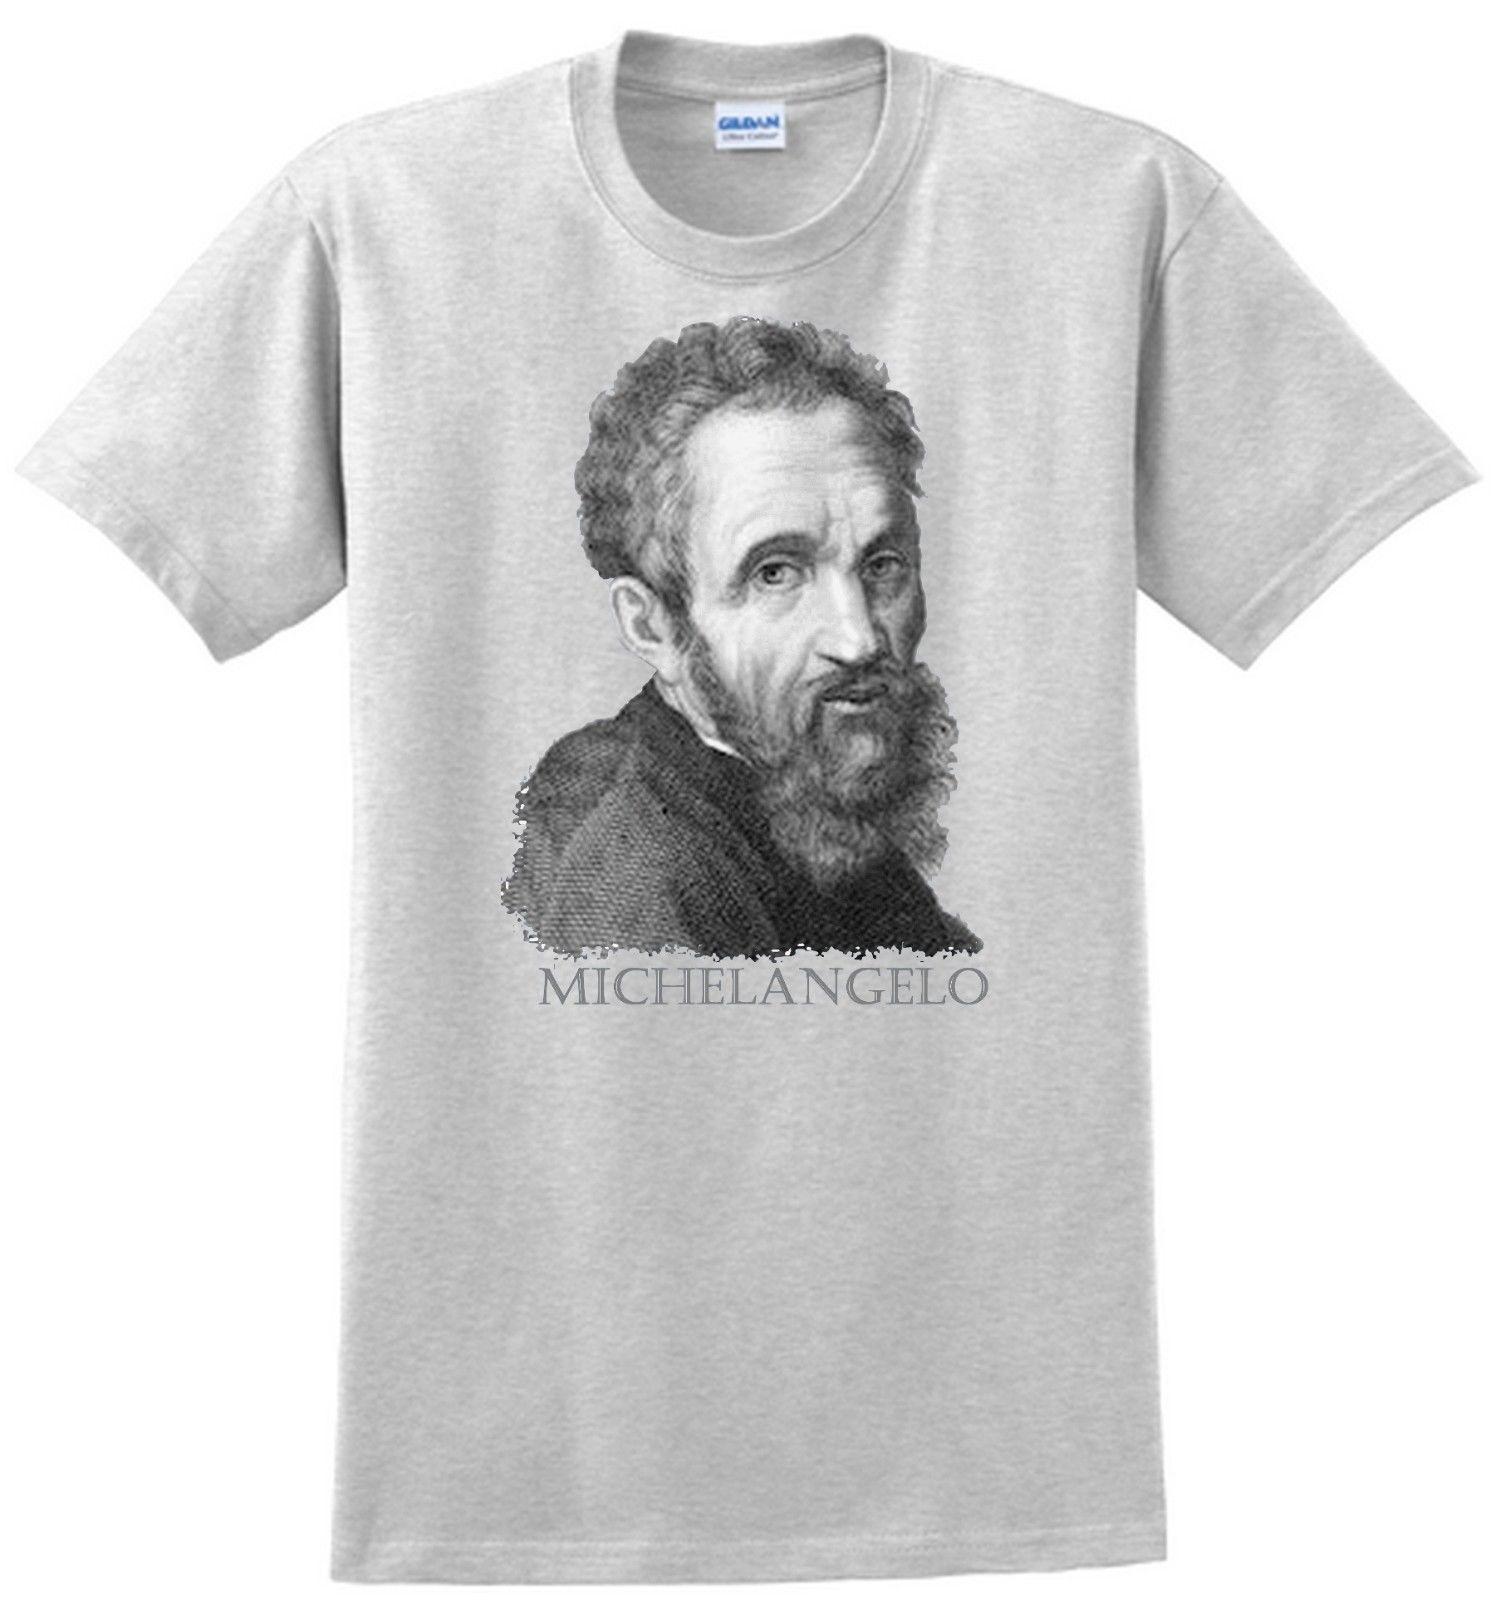 Michelangelo T-shirt  Renaissance sculptor, artist  Gray White,Tee Shirt  Hipster Harajuku Brand Clothing T-Shirt